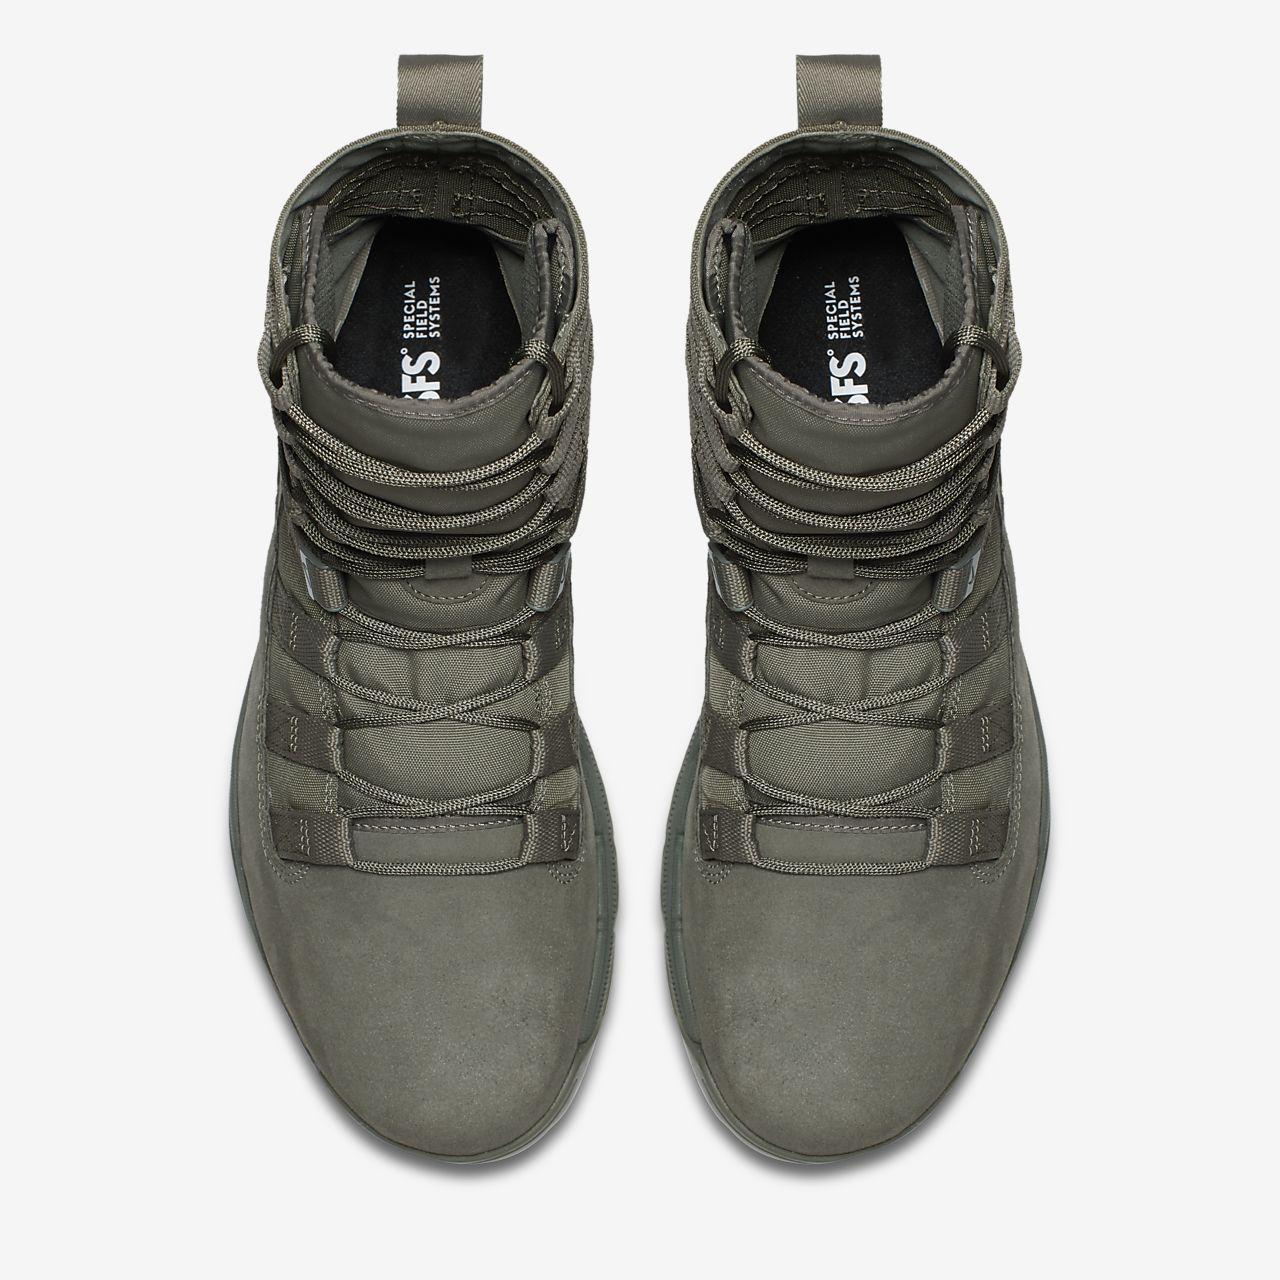 Unisex Boot 22